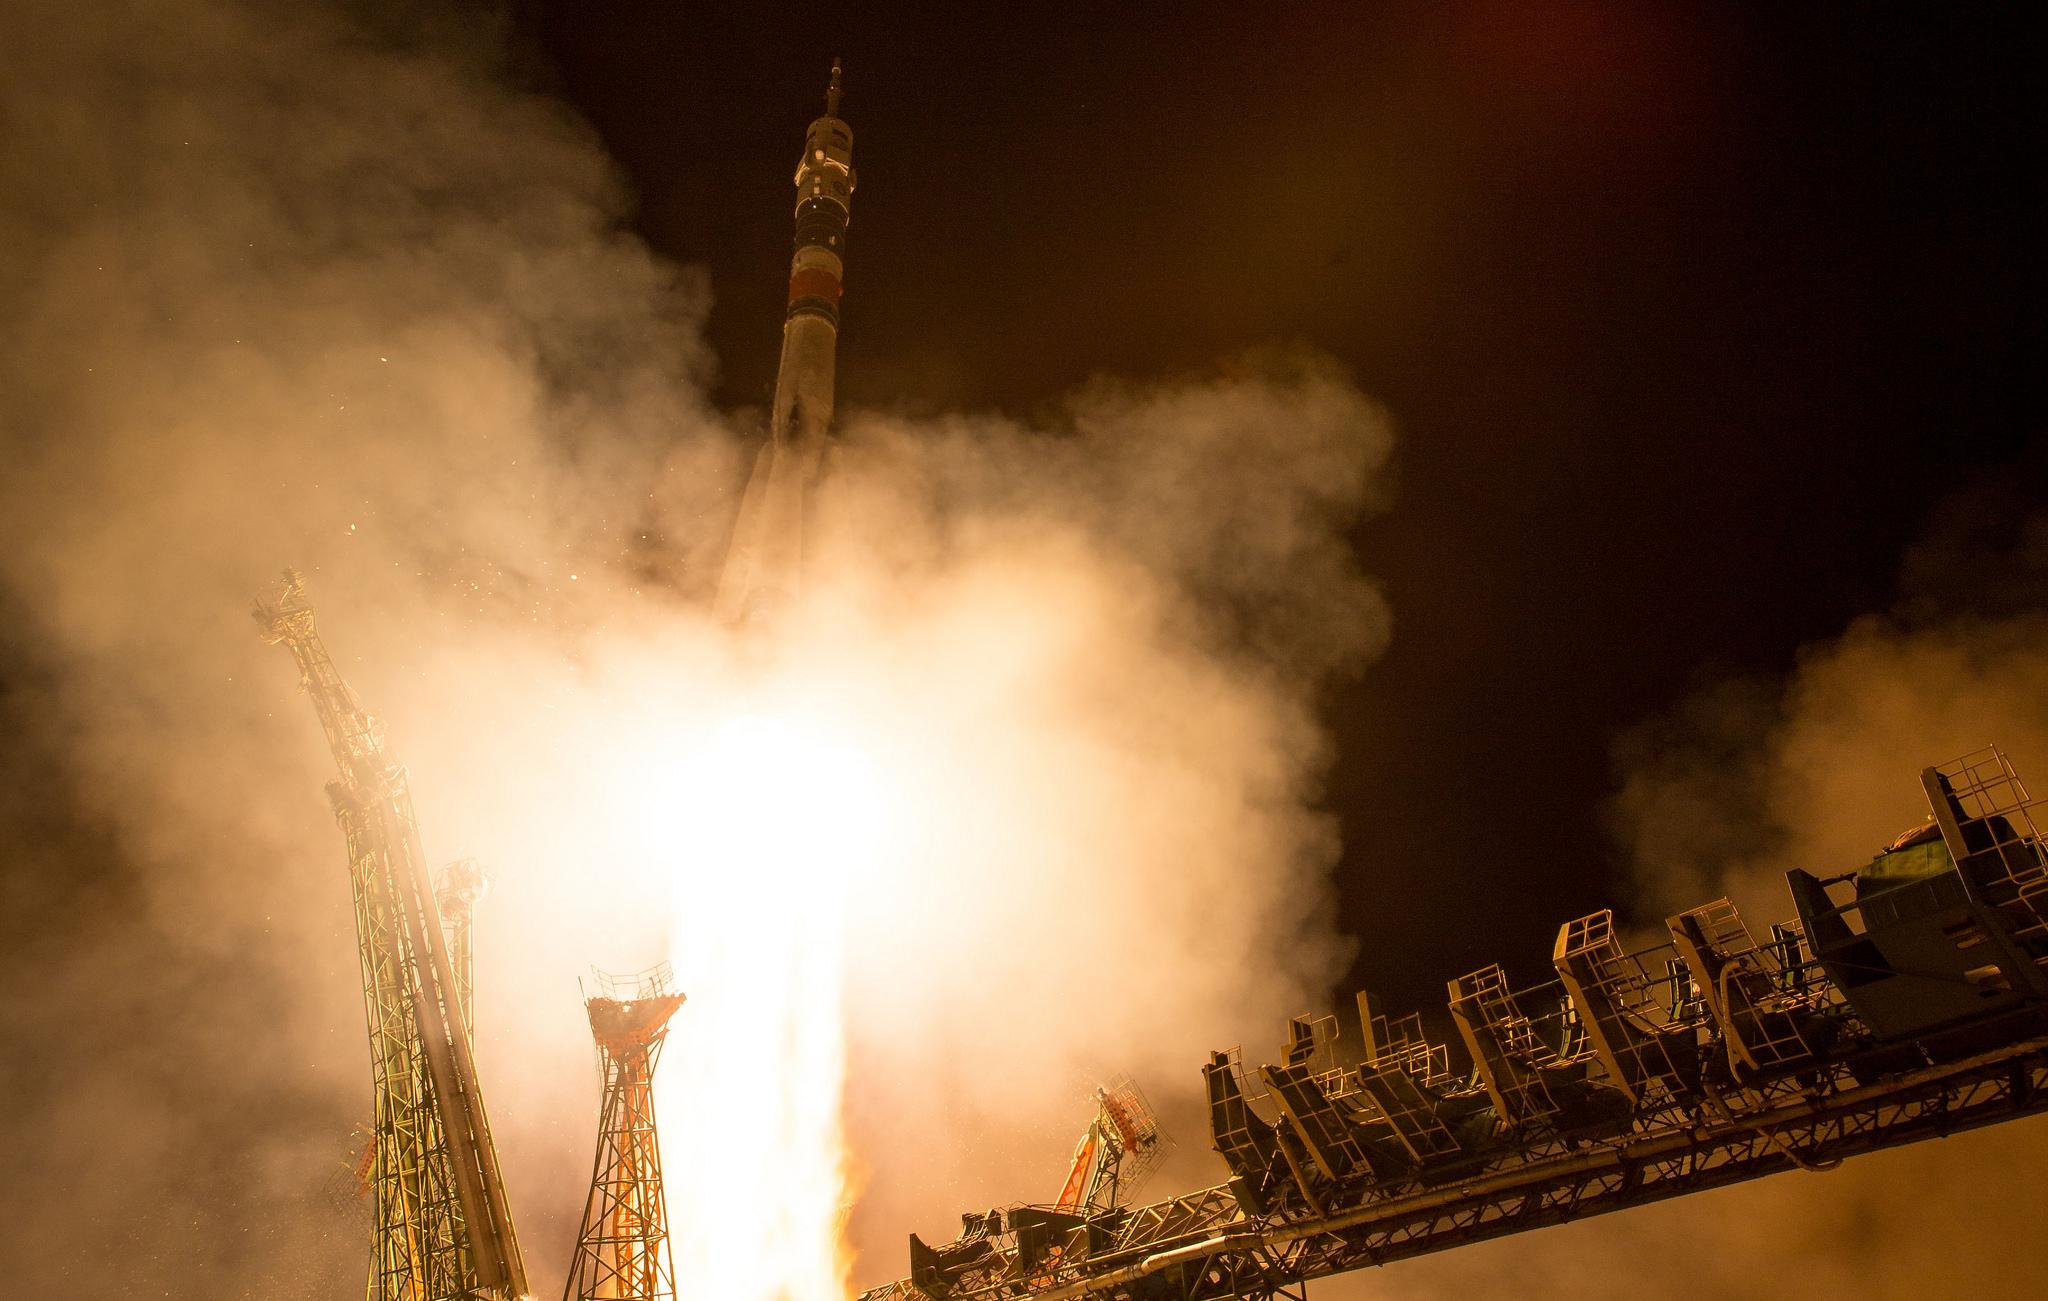 Soyuz MS-08 is launched into space by a Soyuz-FG rocket from Baikonur Cosmodrome, Kazakhstan. Credit: NASA/Joel Kowsky